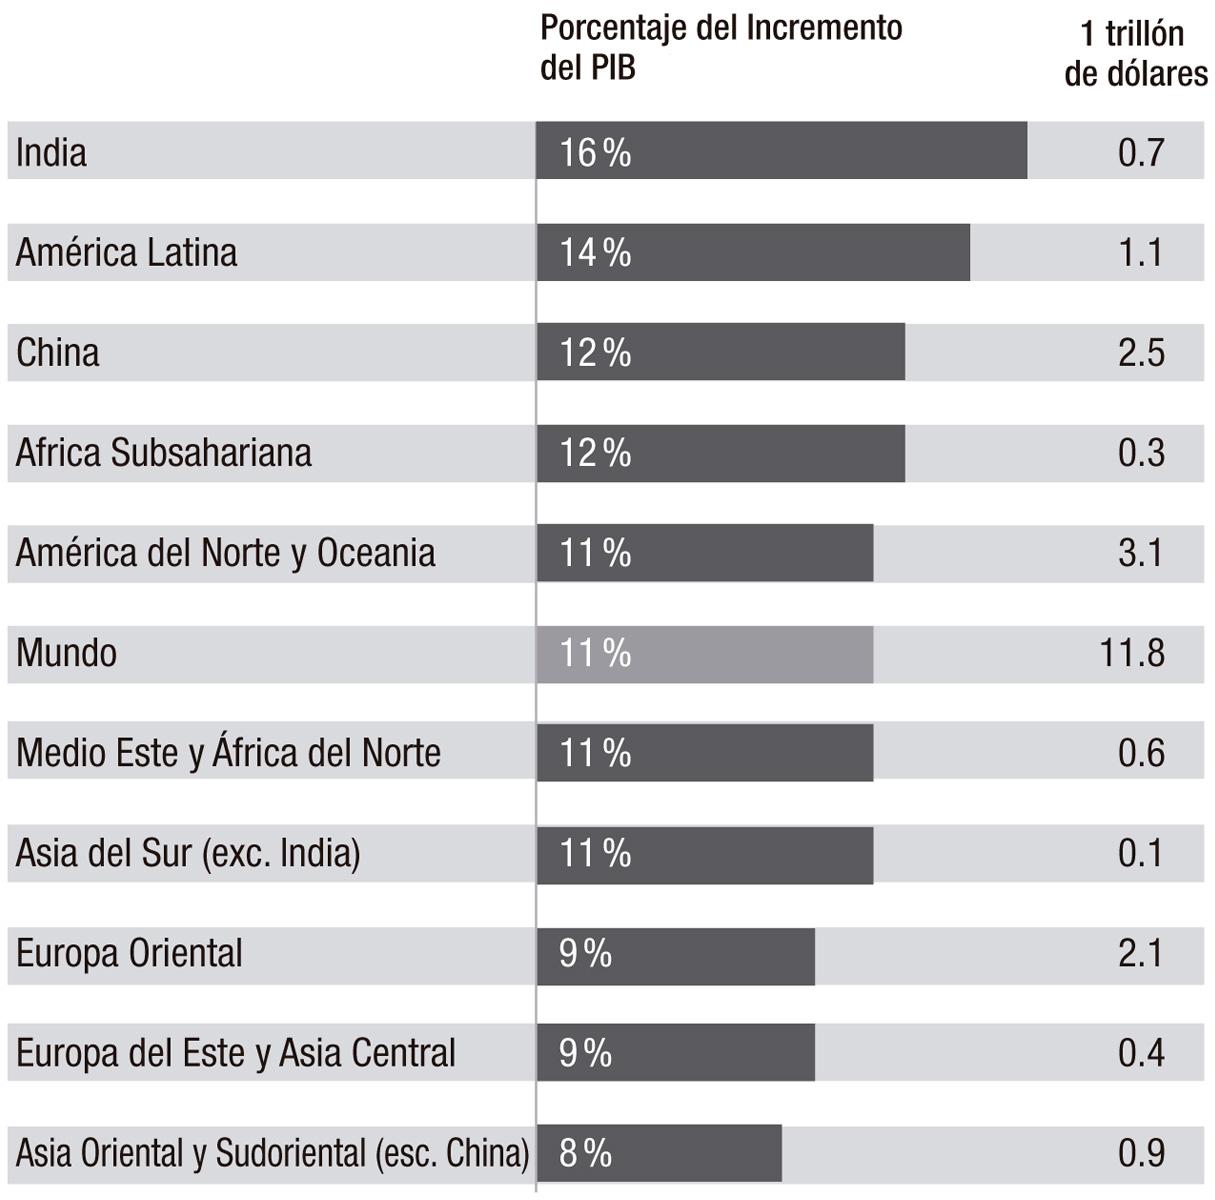 Tabla porcentajes incremento PIB